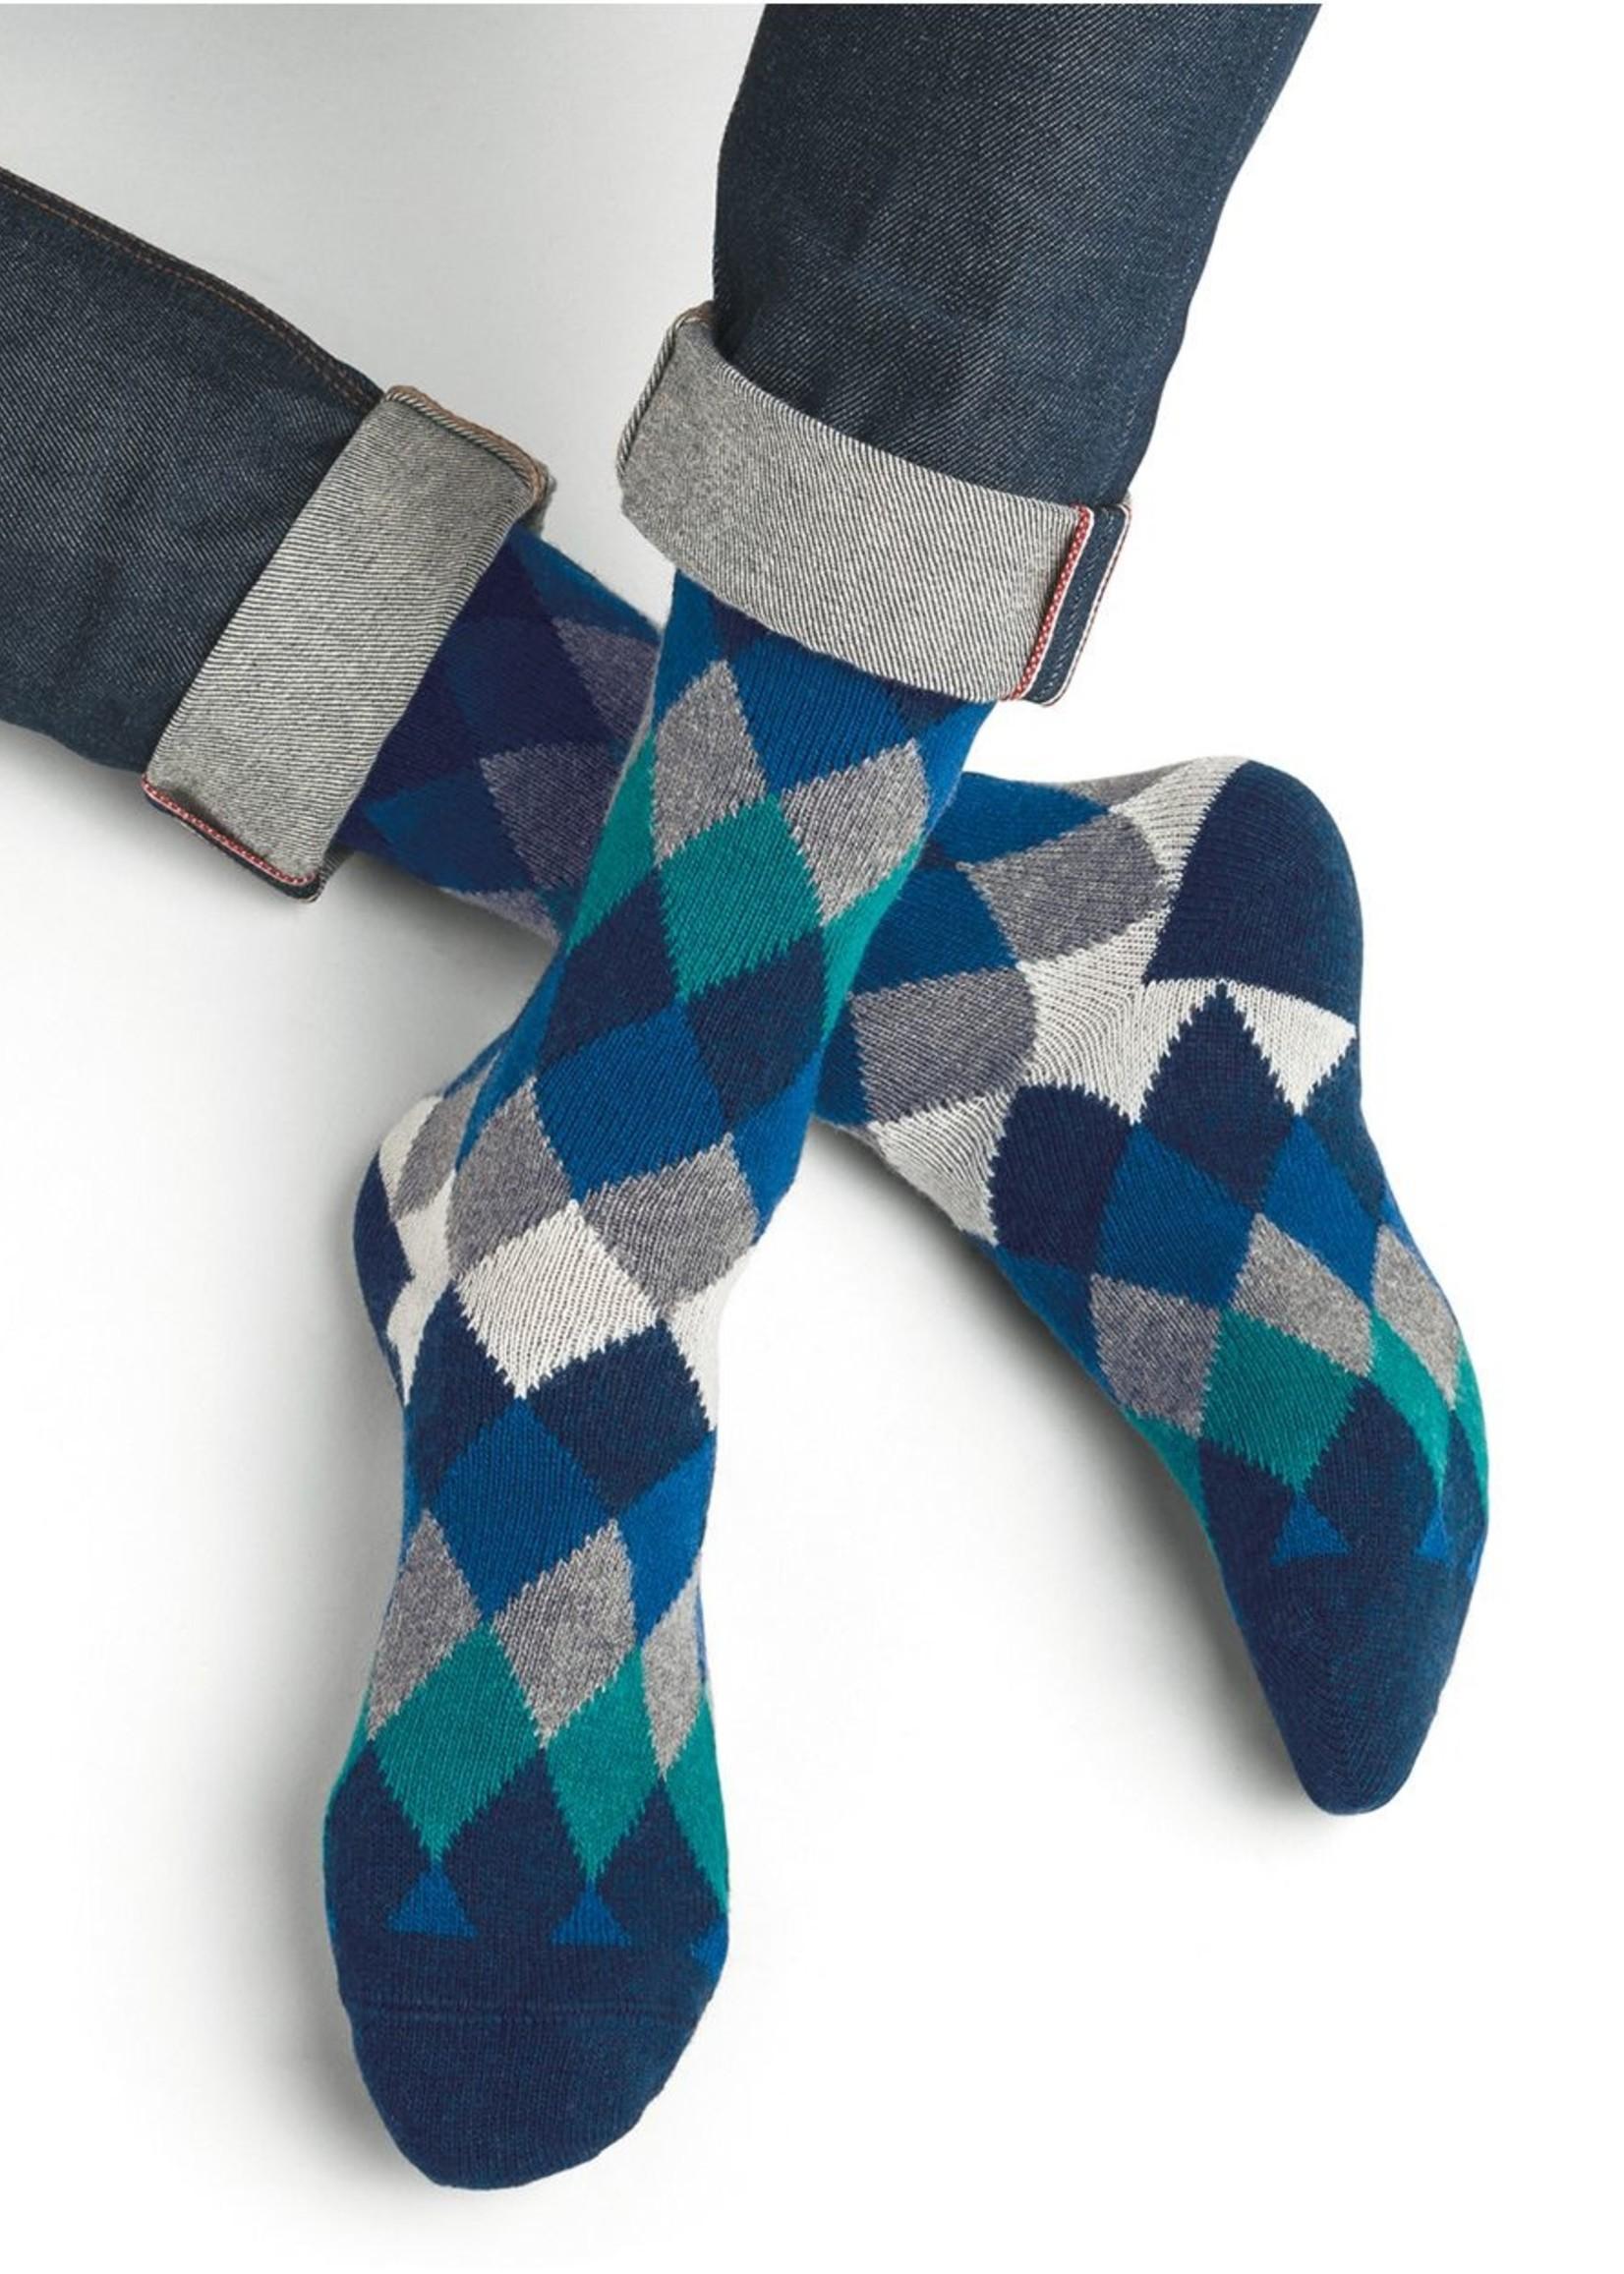 Bleuforet Men's Wool & Cashmere Argyle Socks